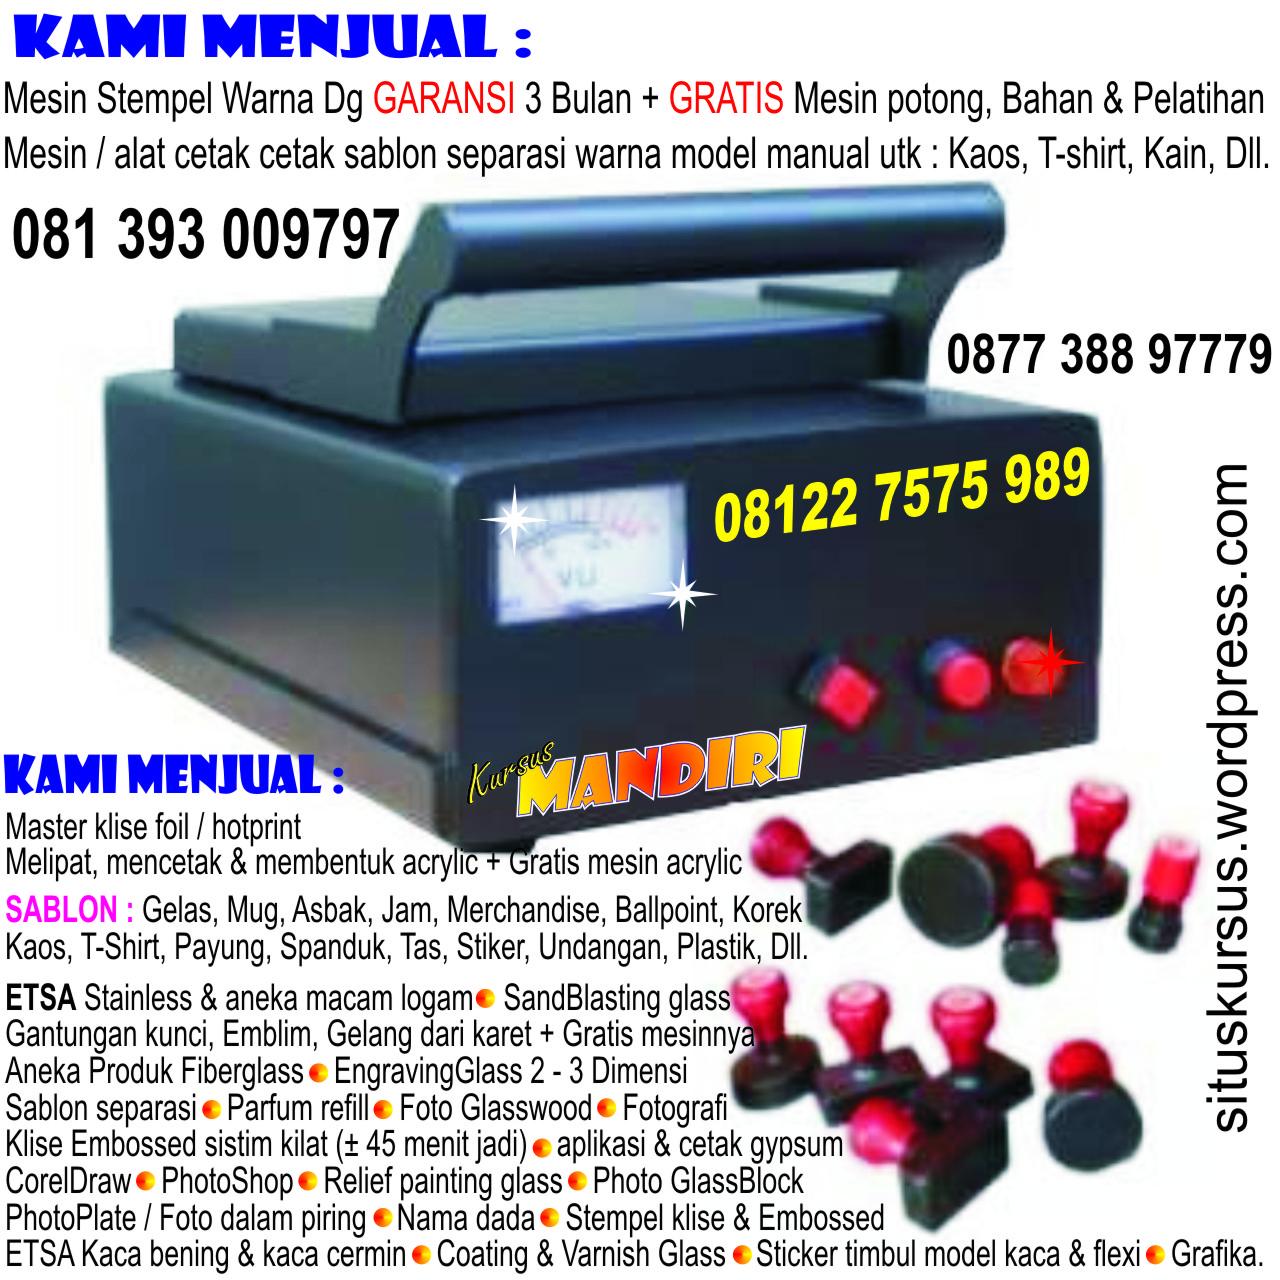 Kursus Plakat Acrylic Amp Fiber Sablon Gelas Amp Mug